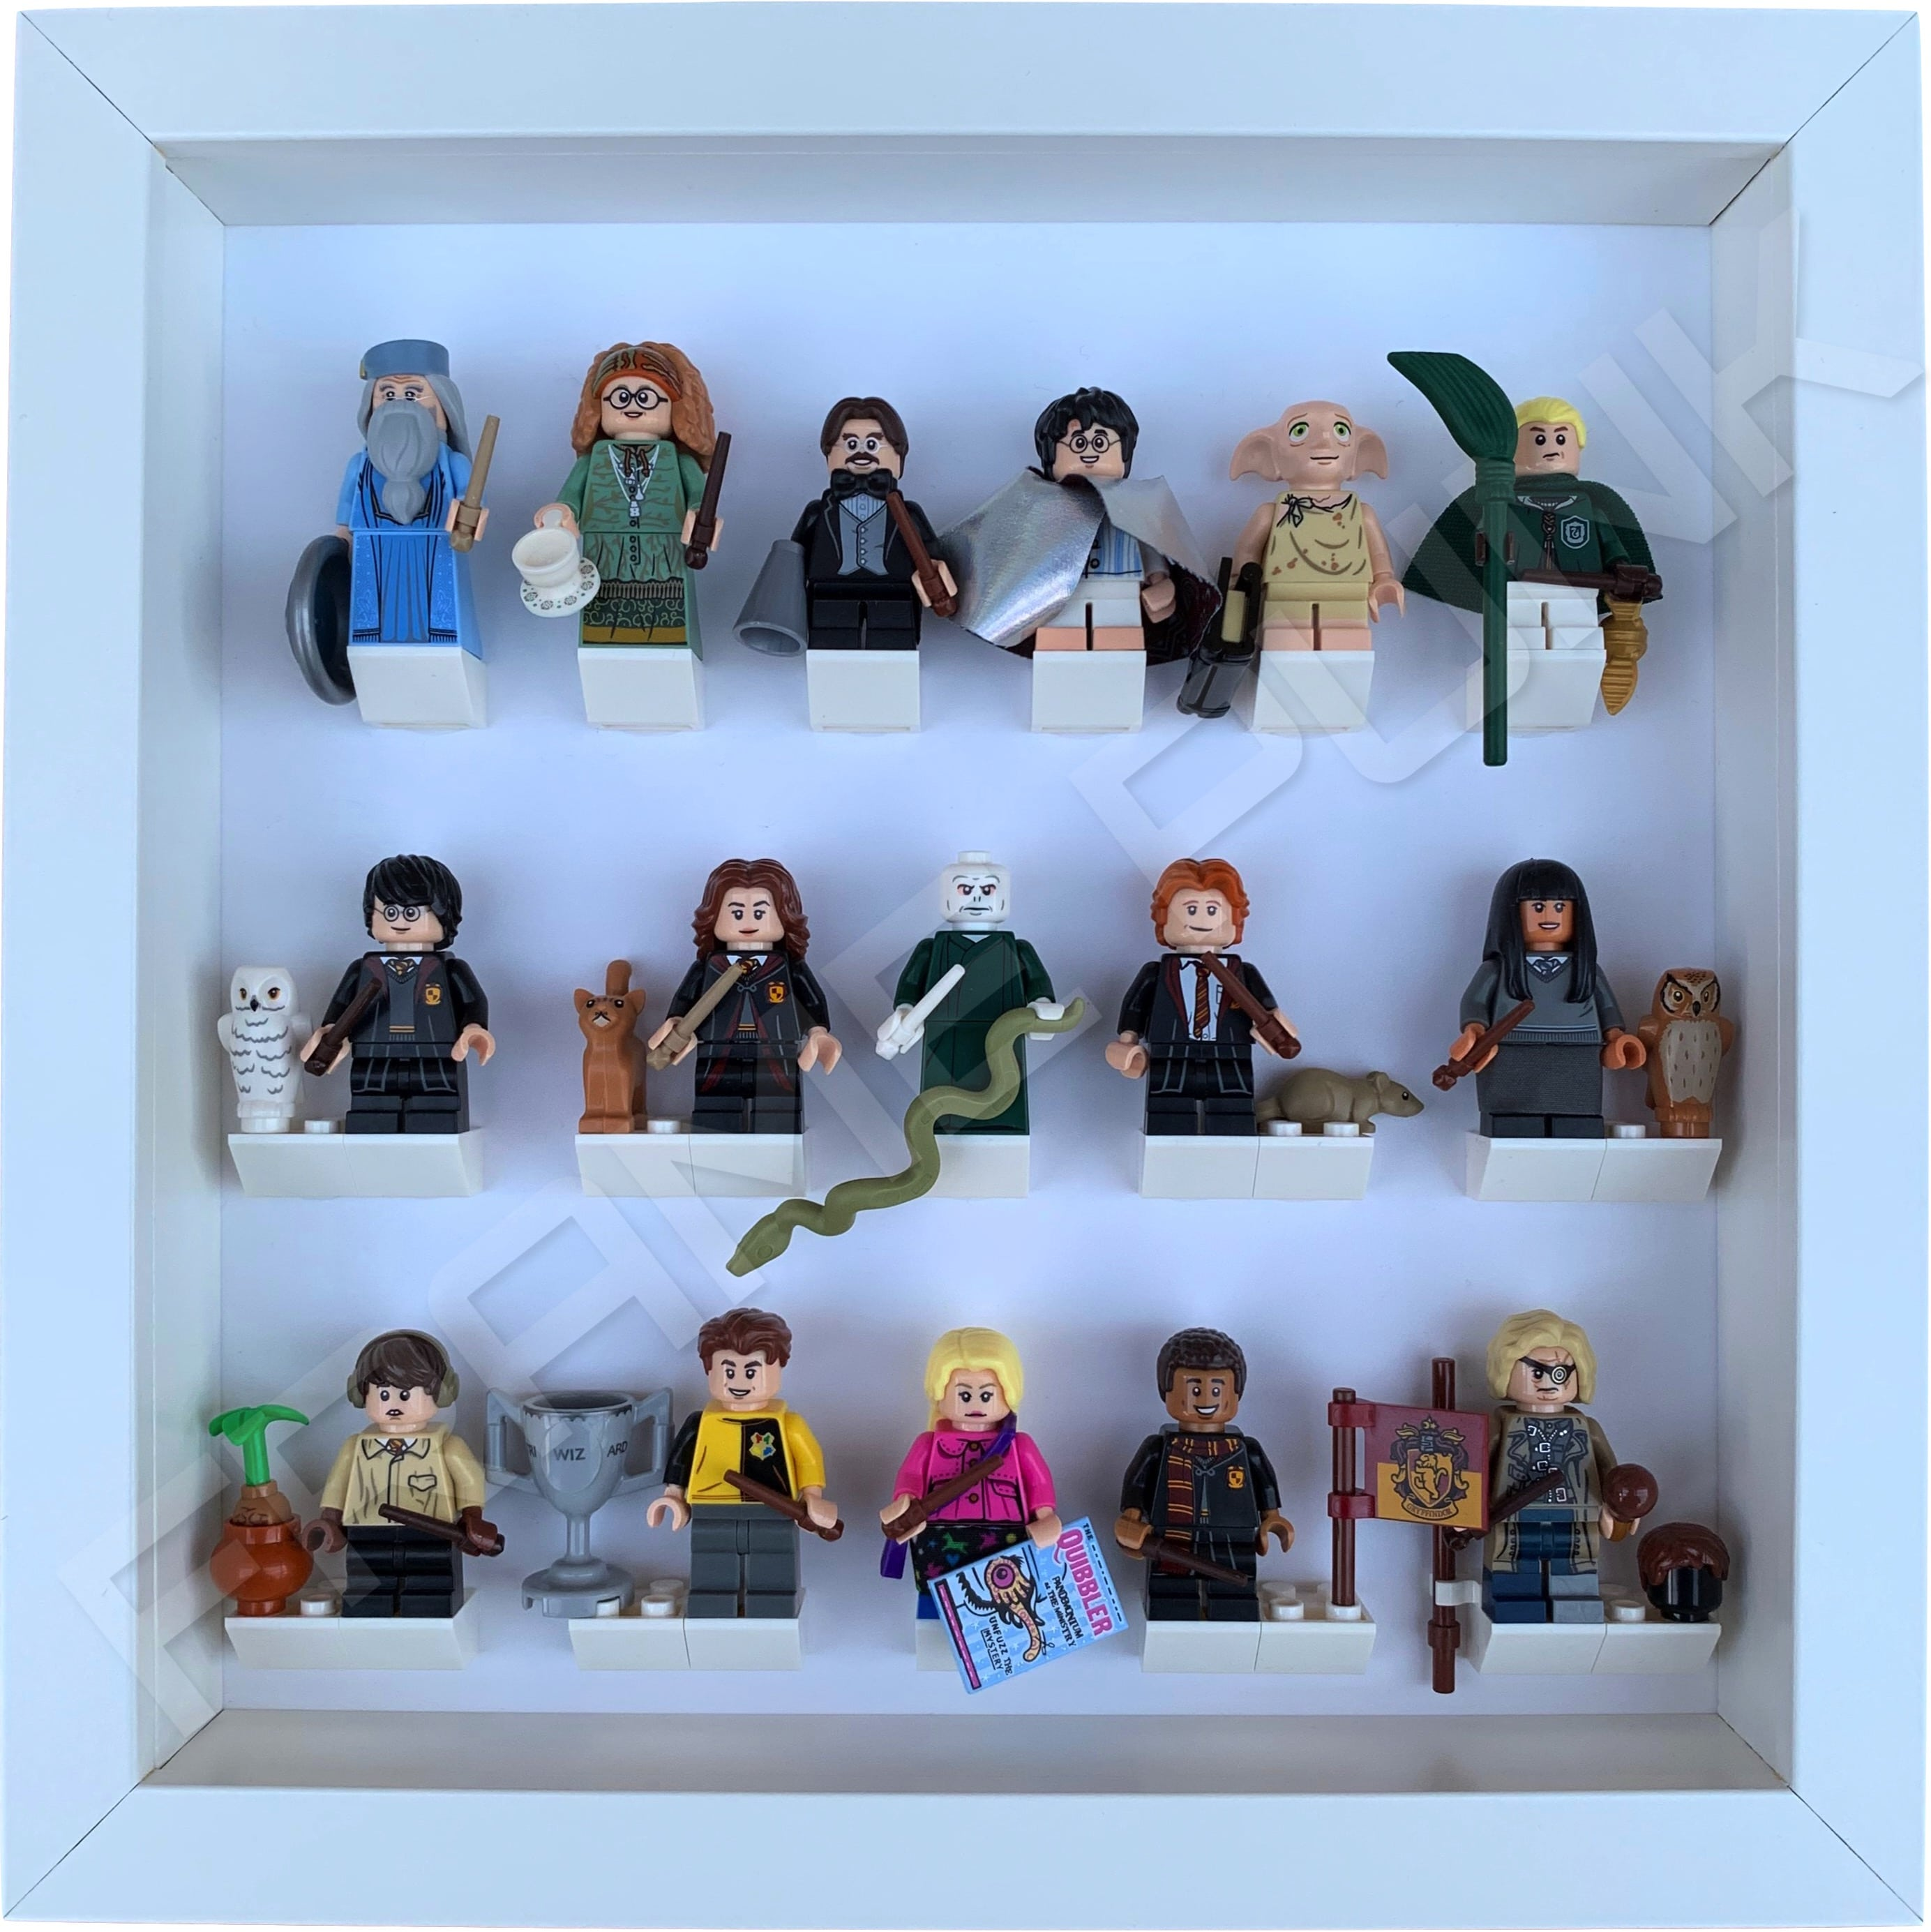 Display Case Frame for Lego Harry Potter minifigures figures